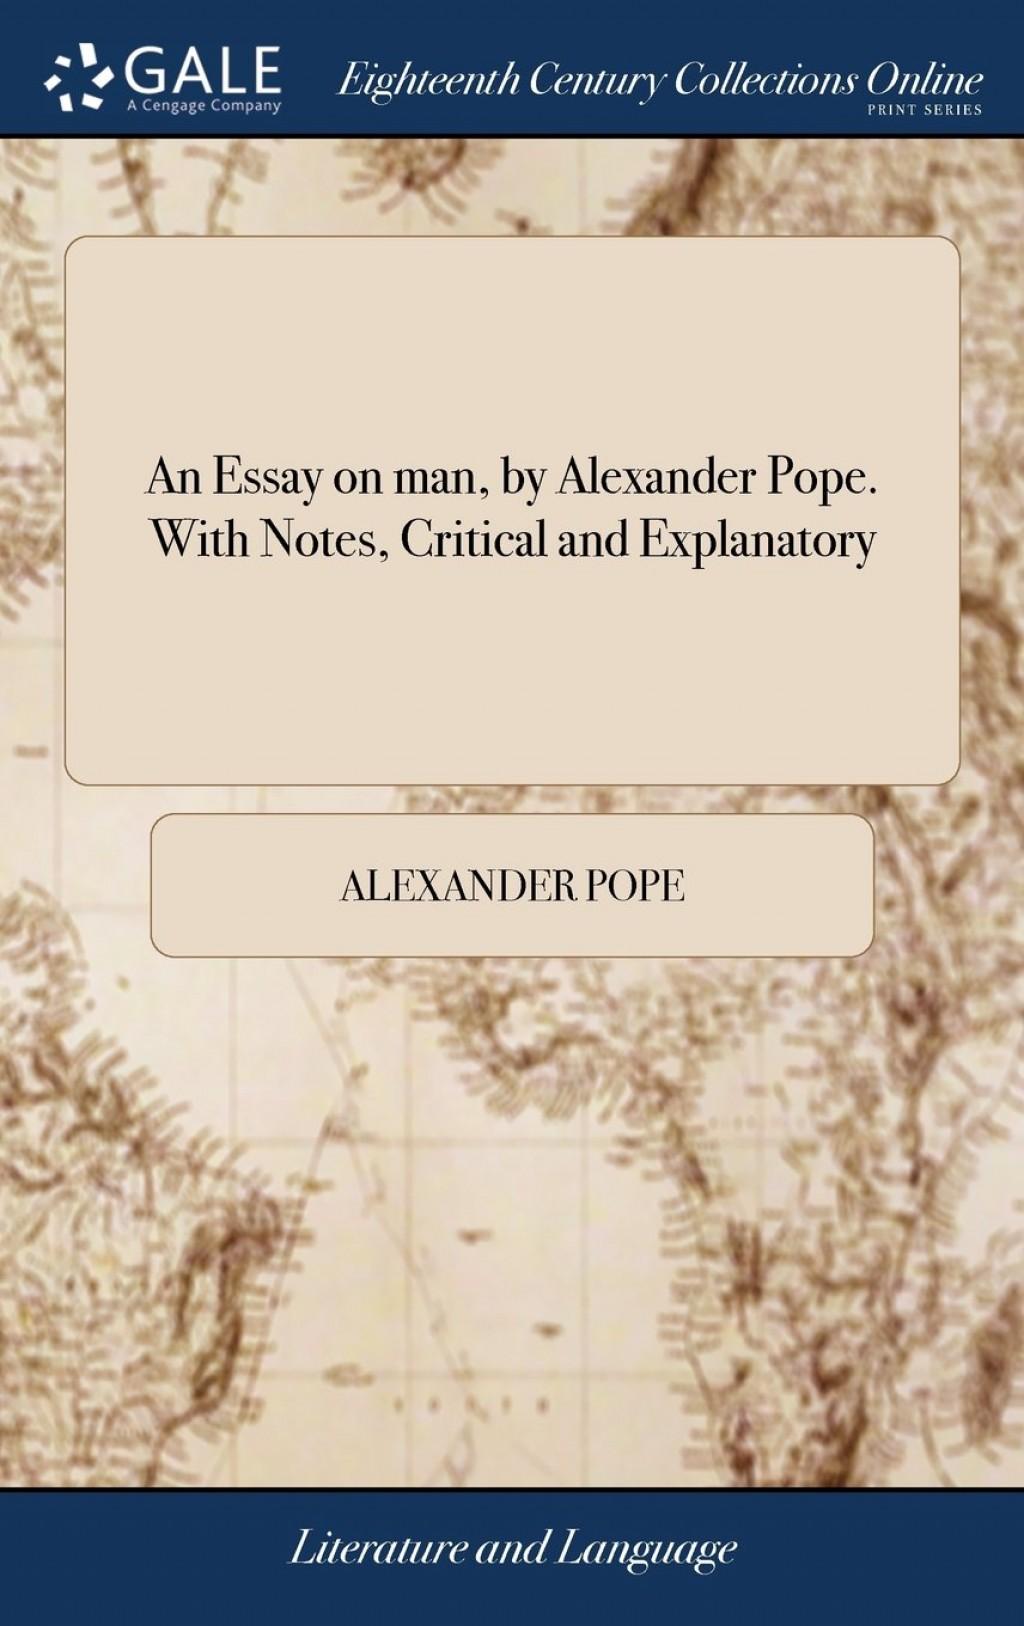 008 71v2b9xkvnpl Essay Example Alexander Pope On Dreaded Man Summary Epistle 2 Pdf Large